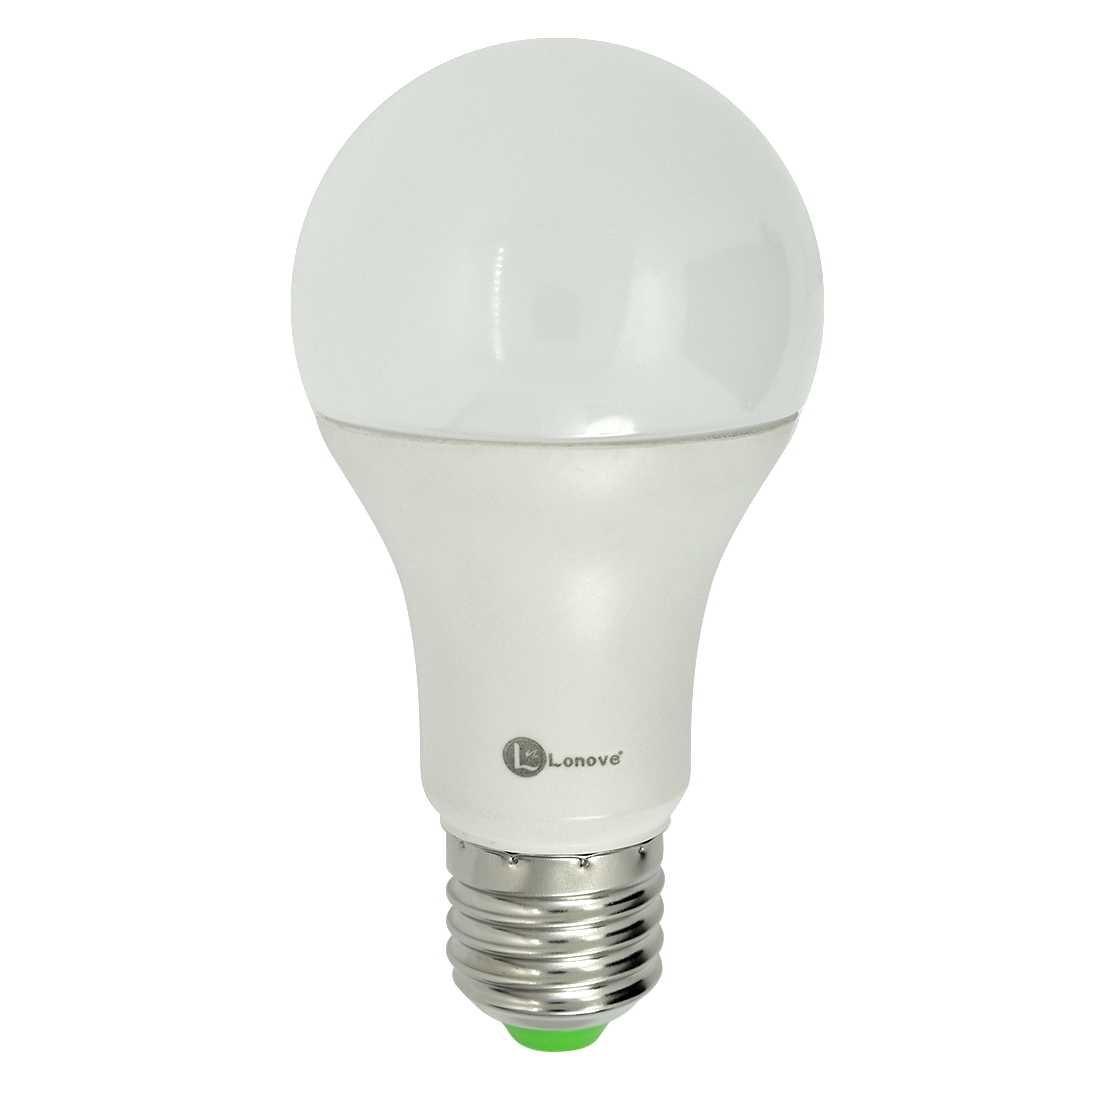 LONOVE RGB Light Bulb 5W LED Remote Control E26 E27 16 Colors Changing Magic Moon Night Lamp